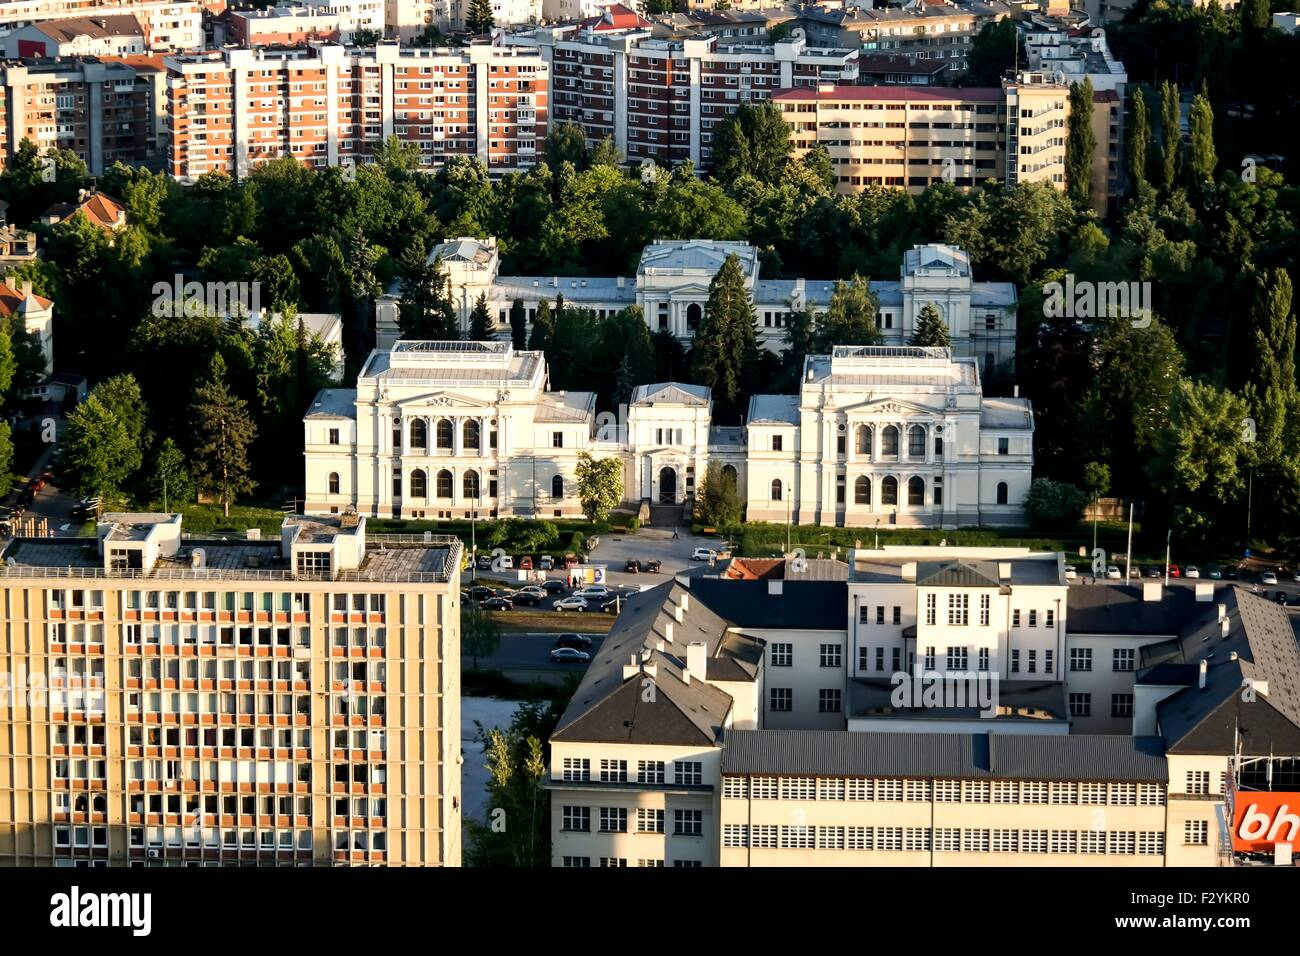 The National Museum of Bosnia and Herzegovina - Stock Image